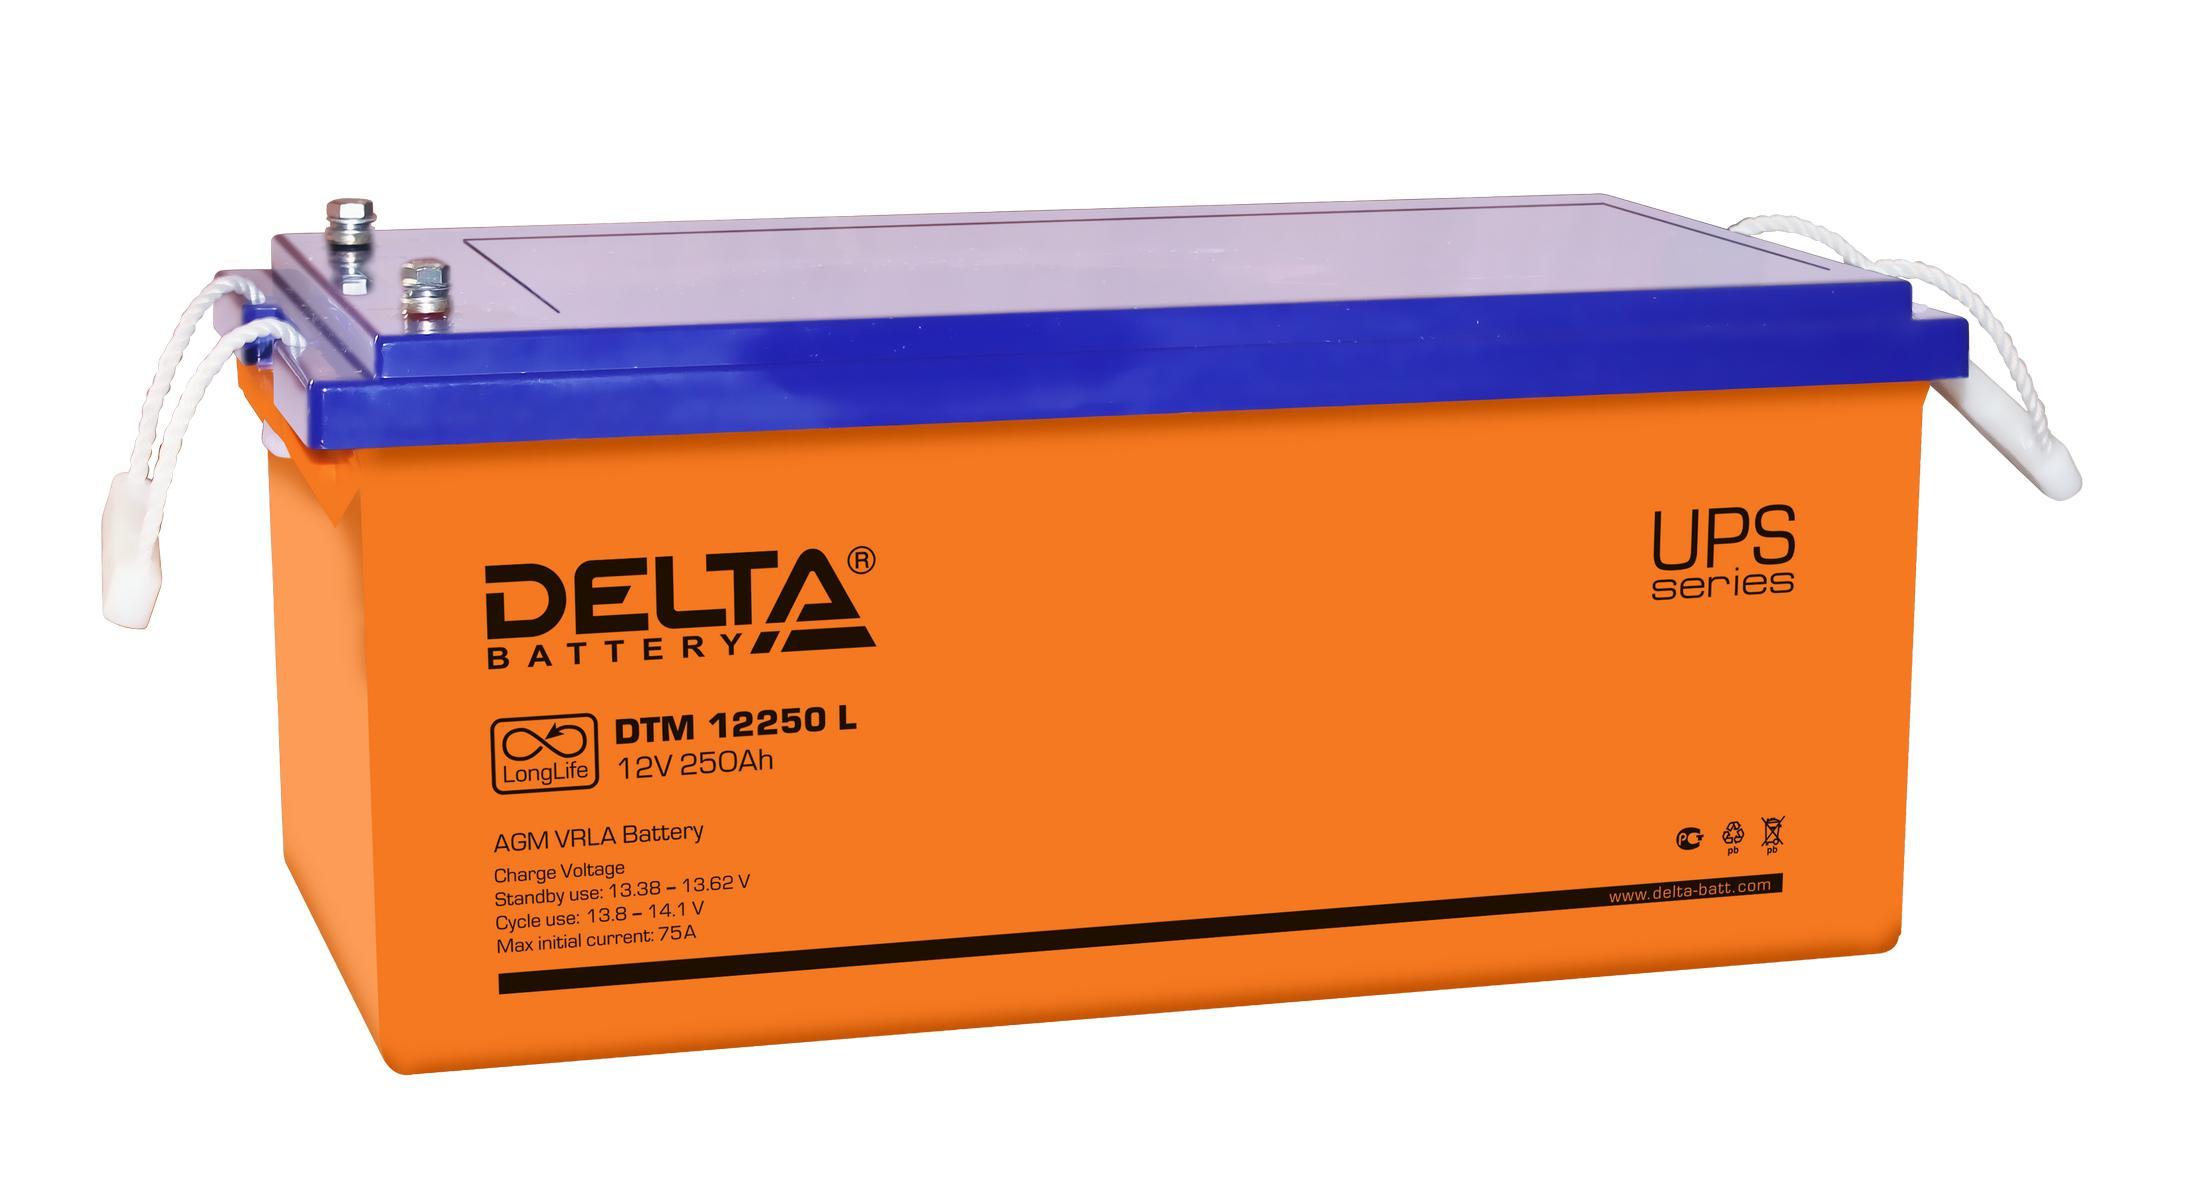 Аккумулятор для ИБП Delta Dtm 12250 l